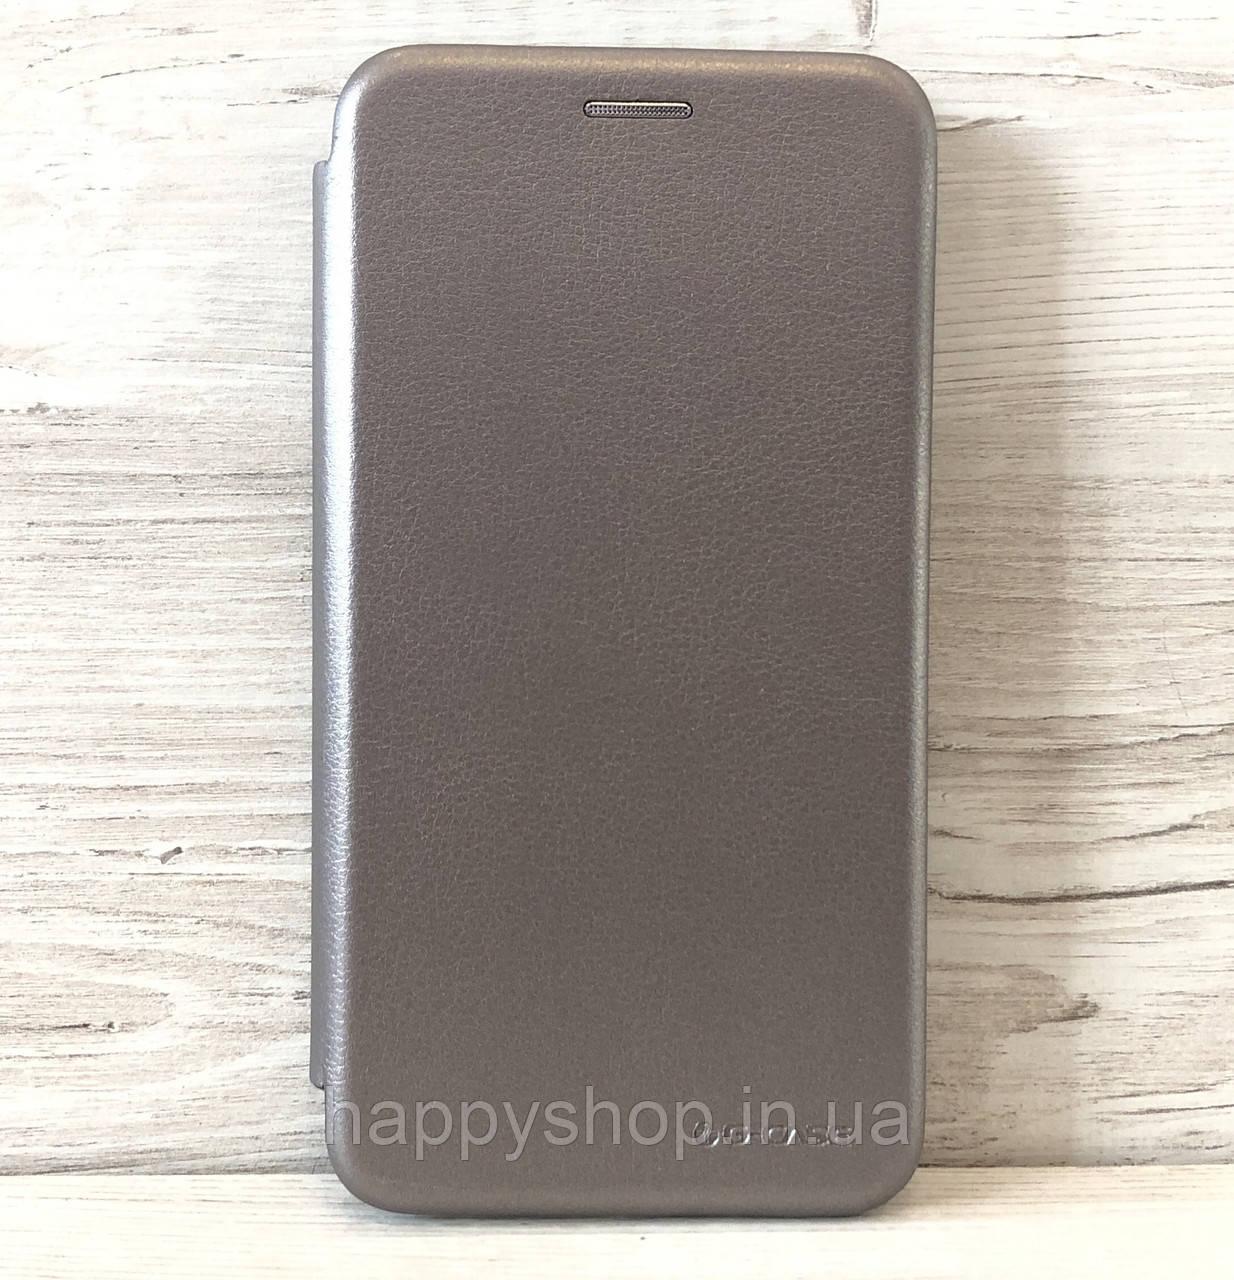 Чехол-книжка G-Case для Samsung Galaxy A8 Plus 2018 (A730) Серый